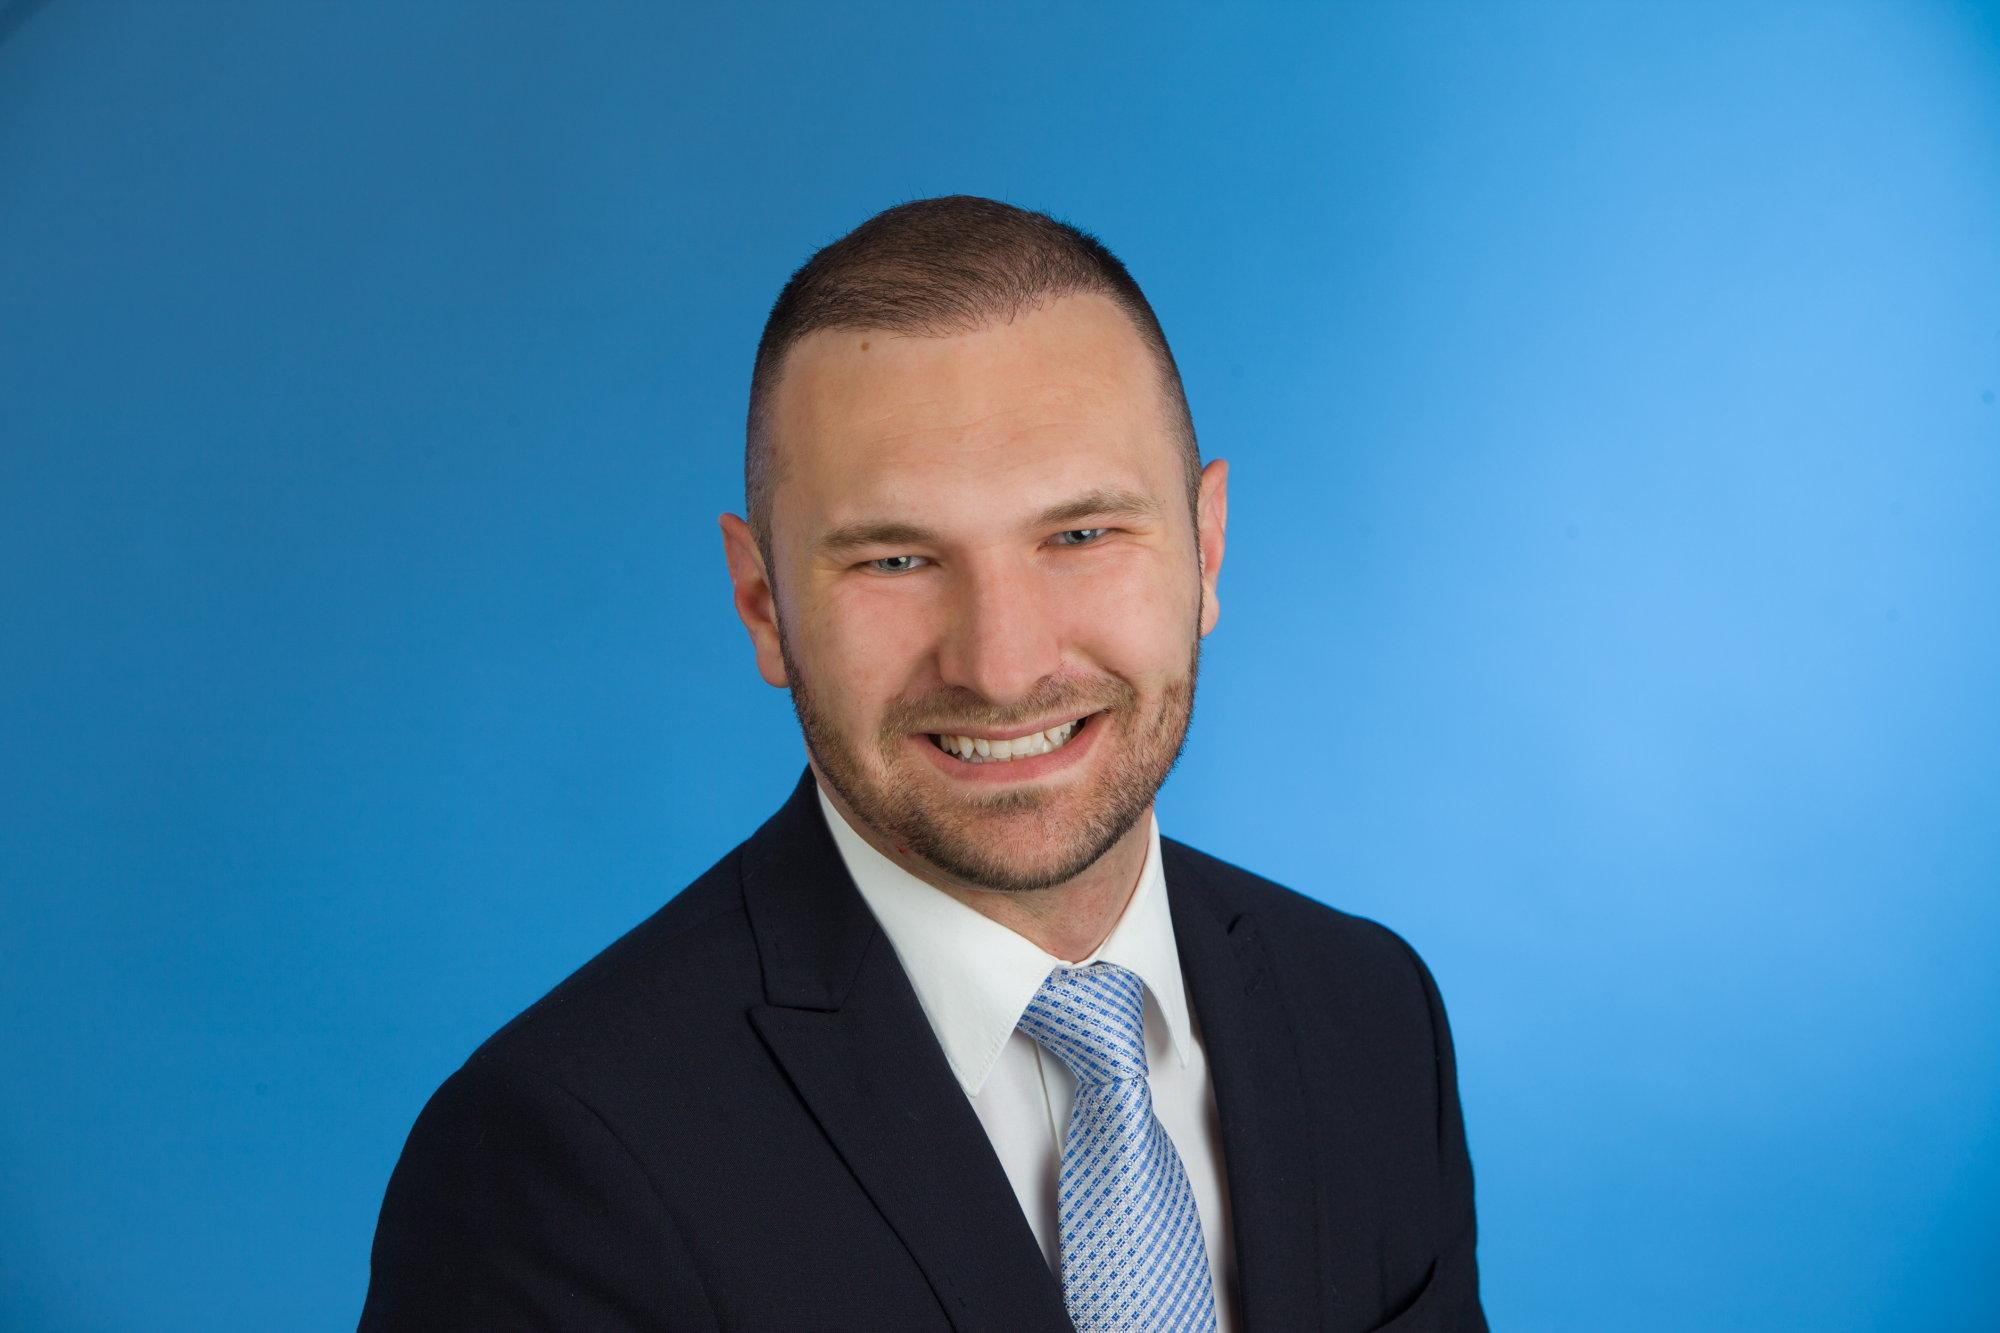 Dimitri Schulz